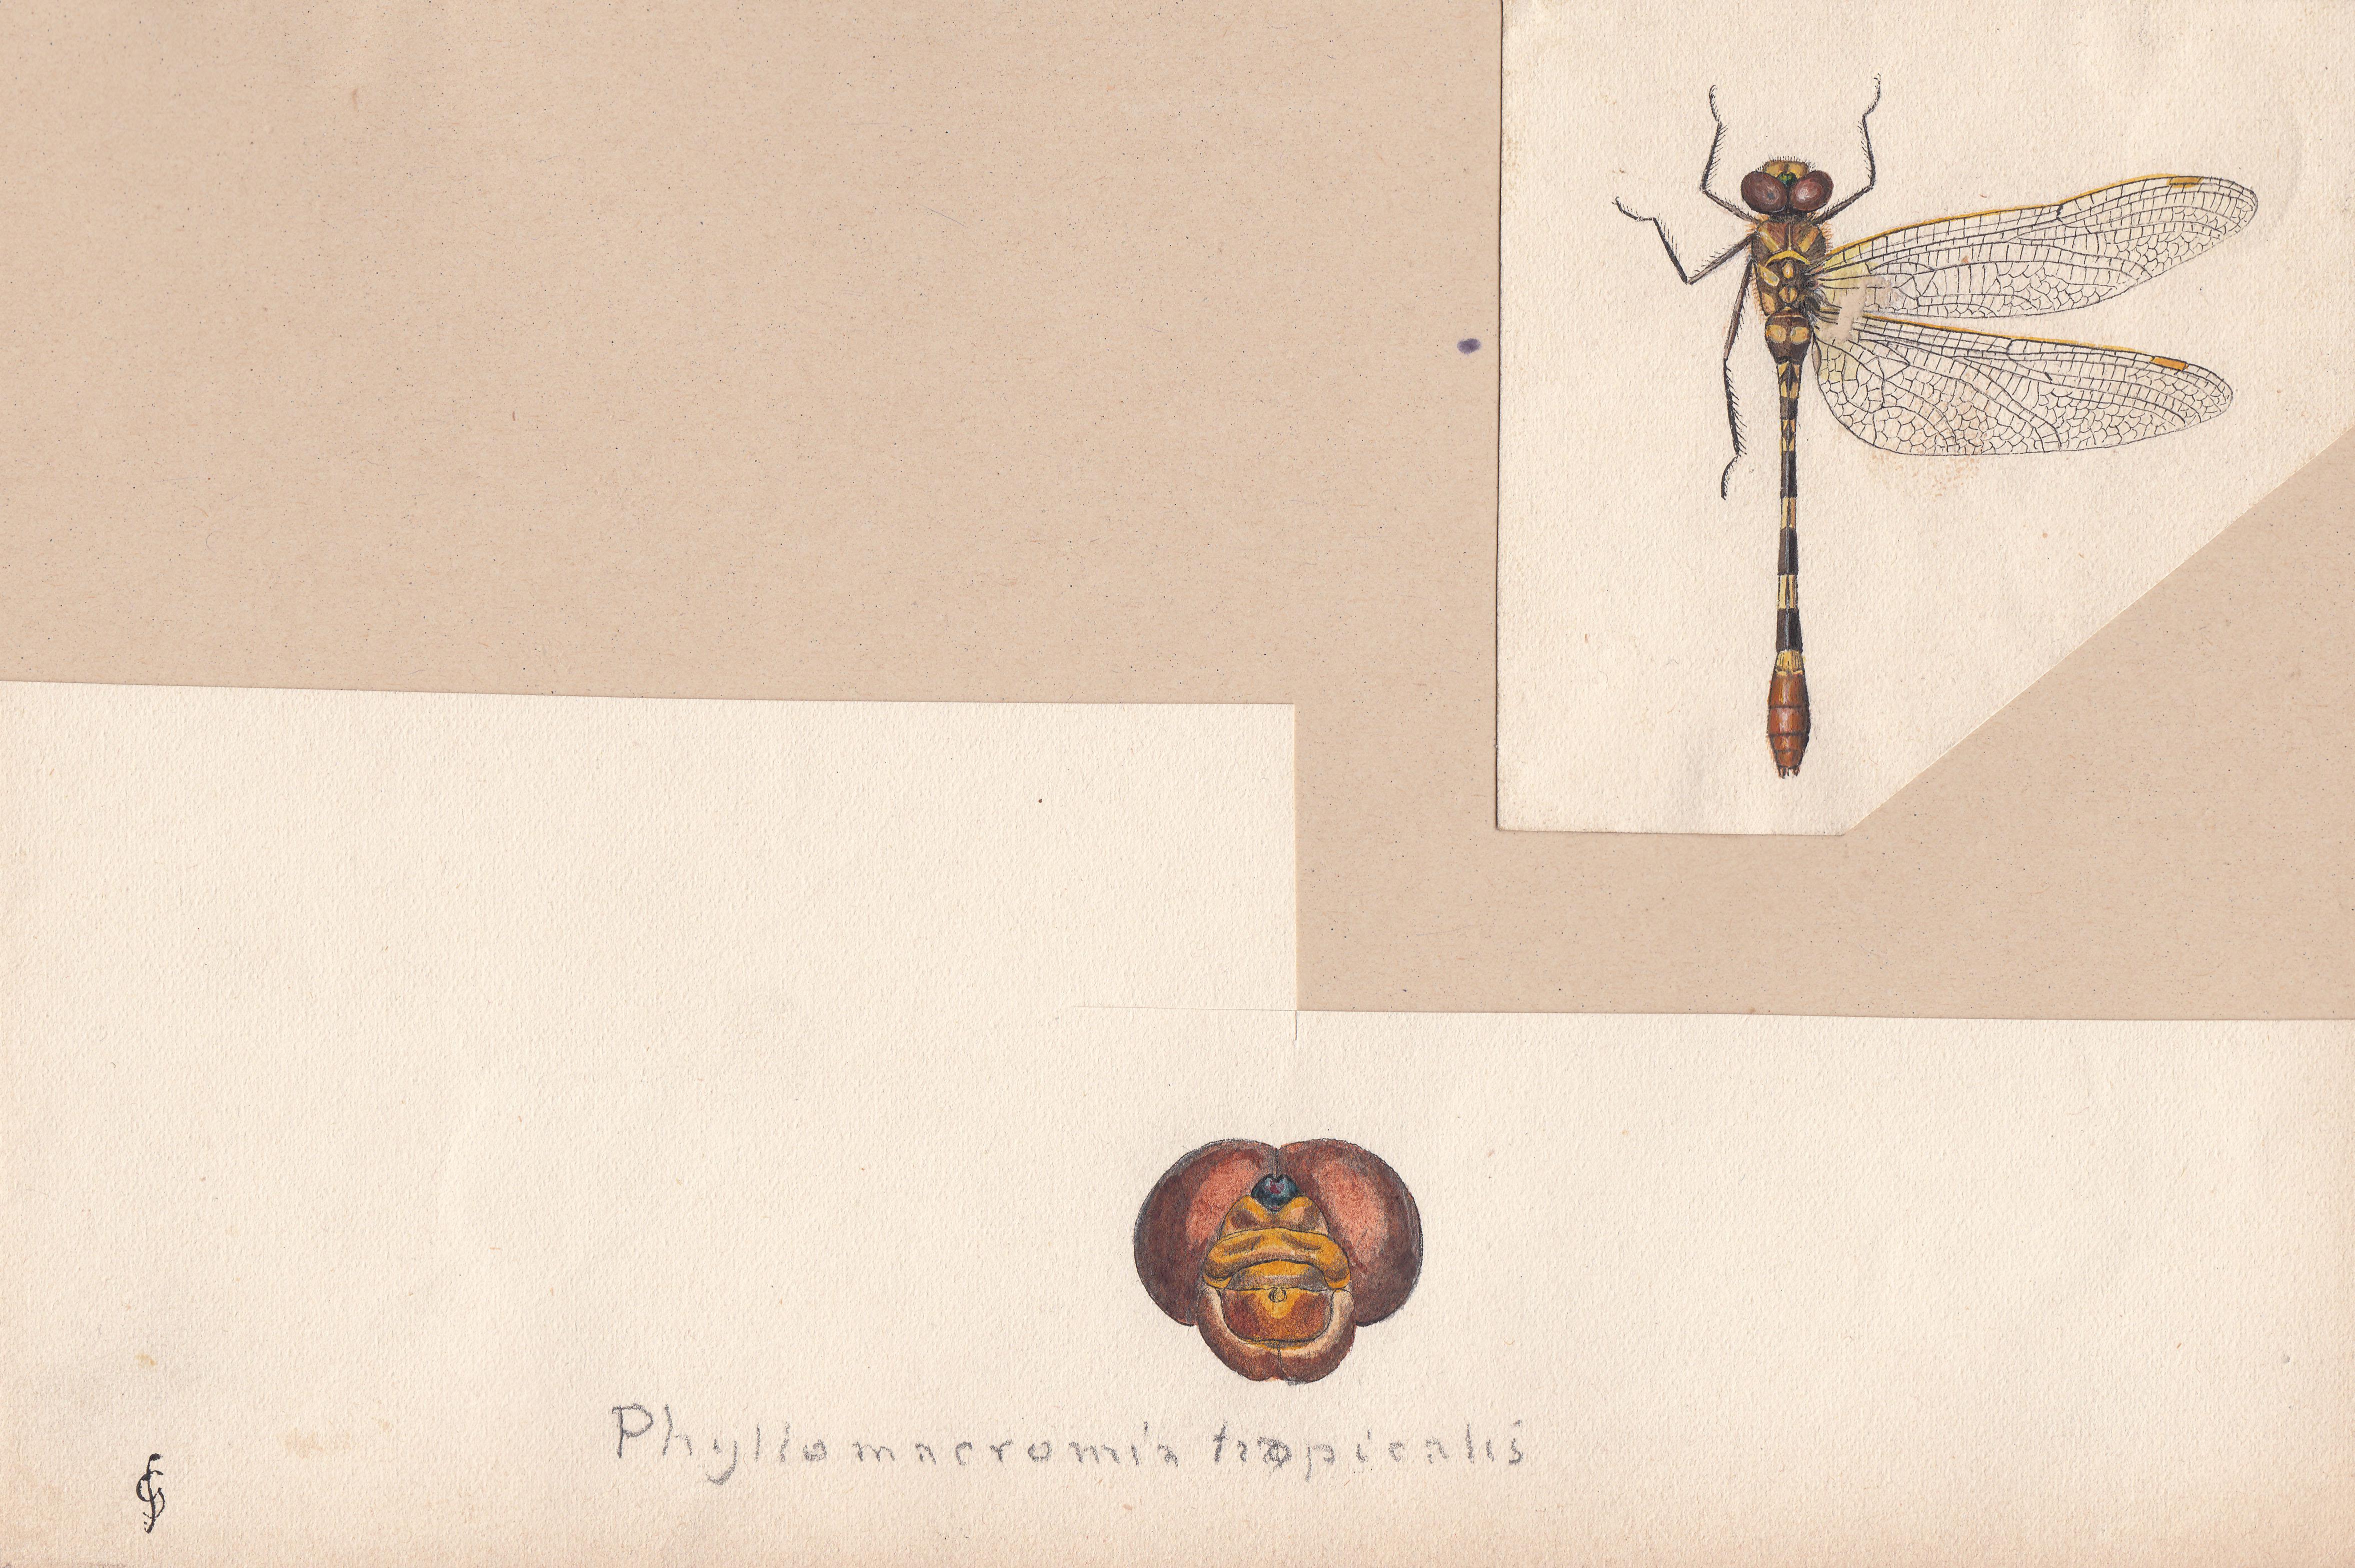 Phyllomacromia tropicalis.jpg